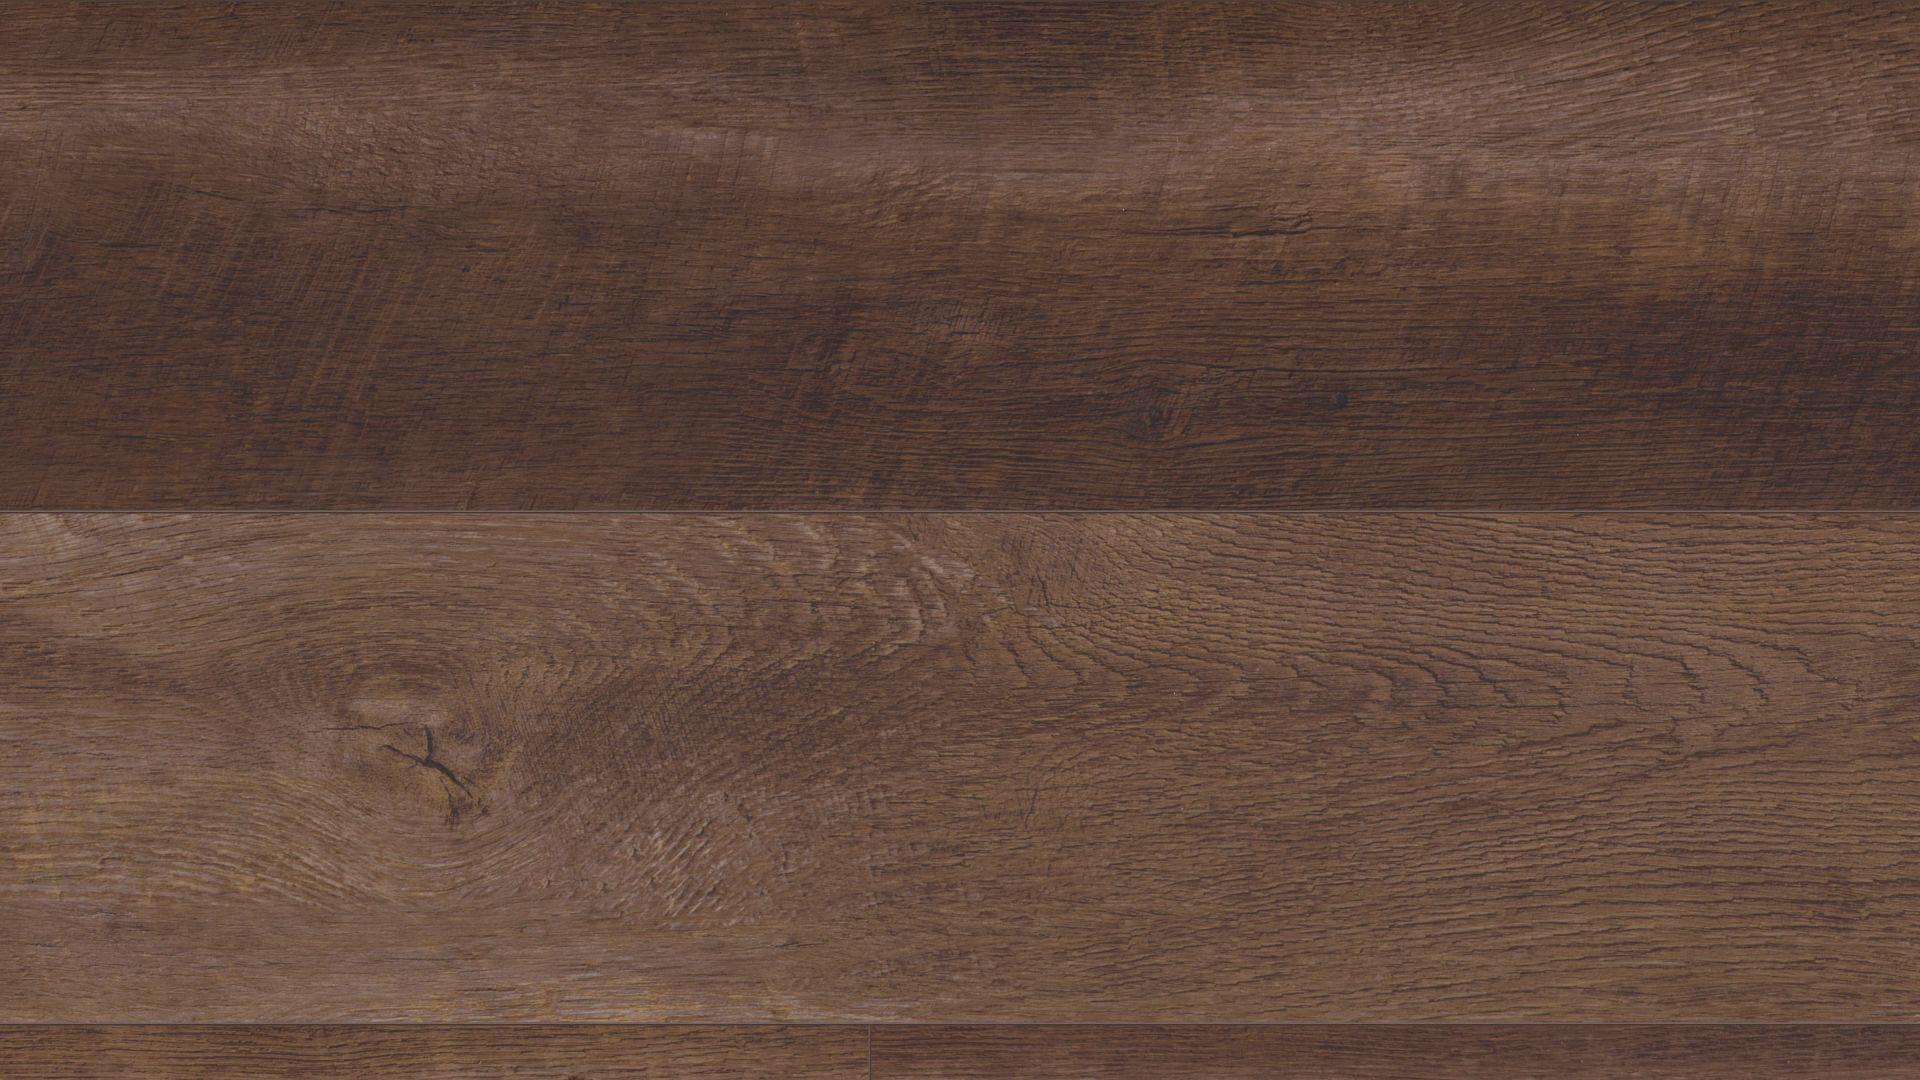 VINEYARD BARREL DRIFTWOOD EVP Vinyl Flooring Product Shot